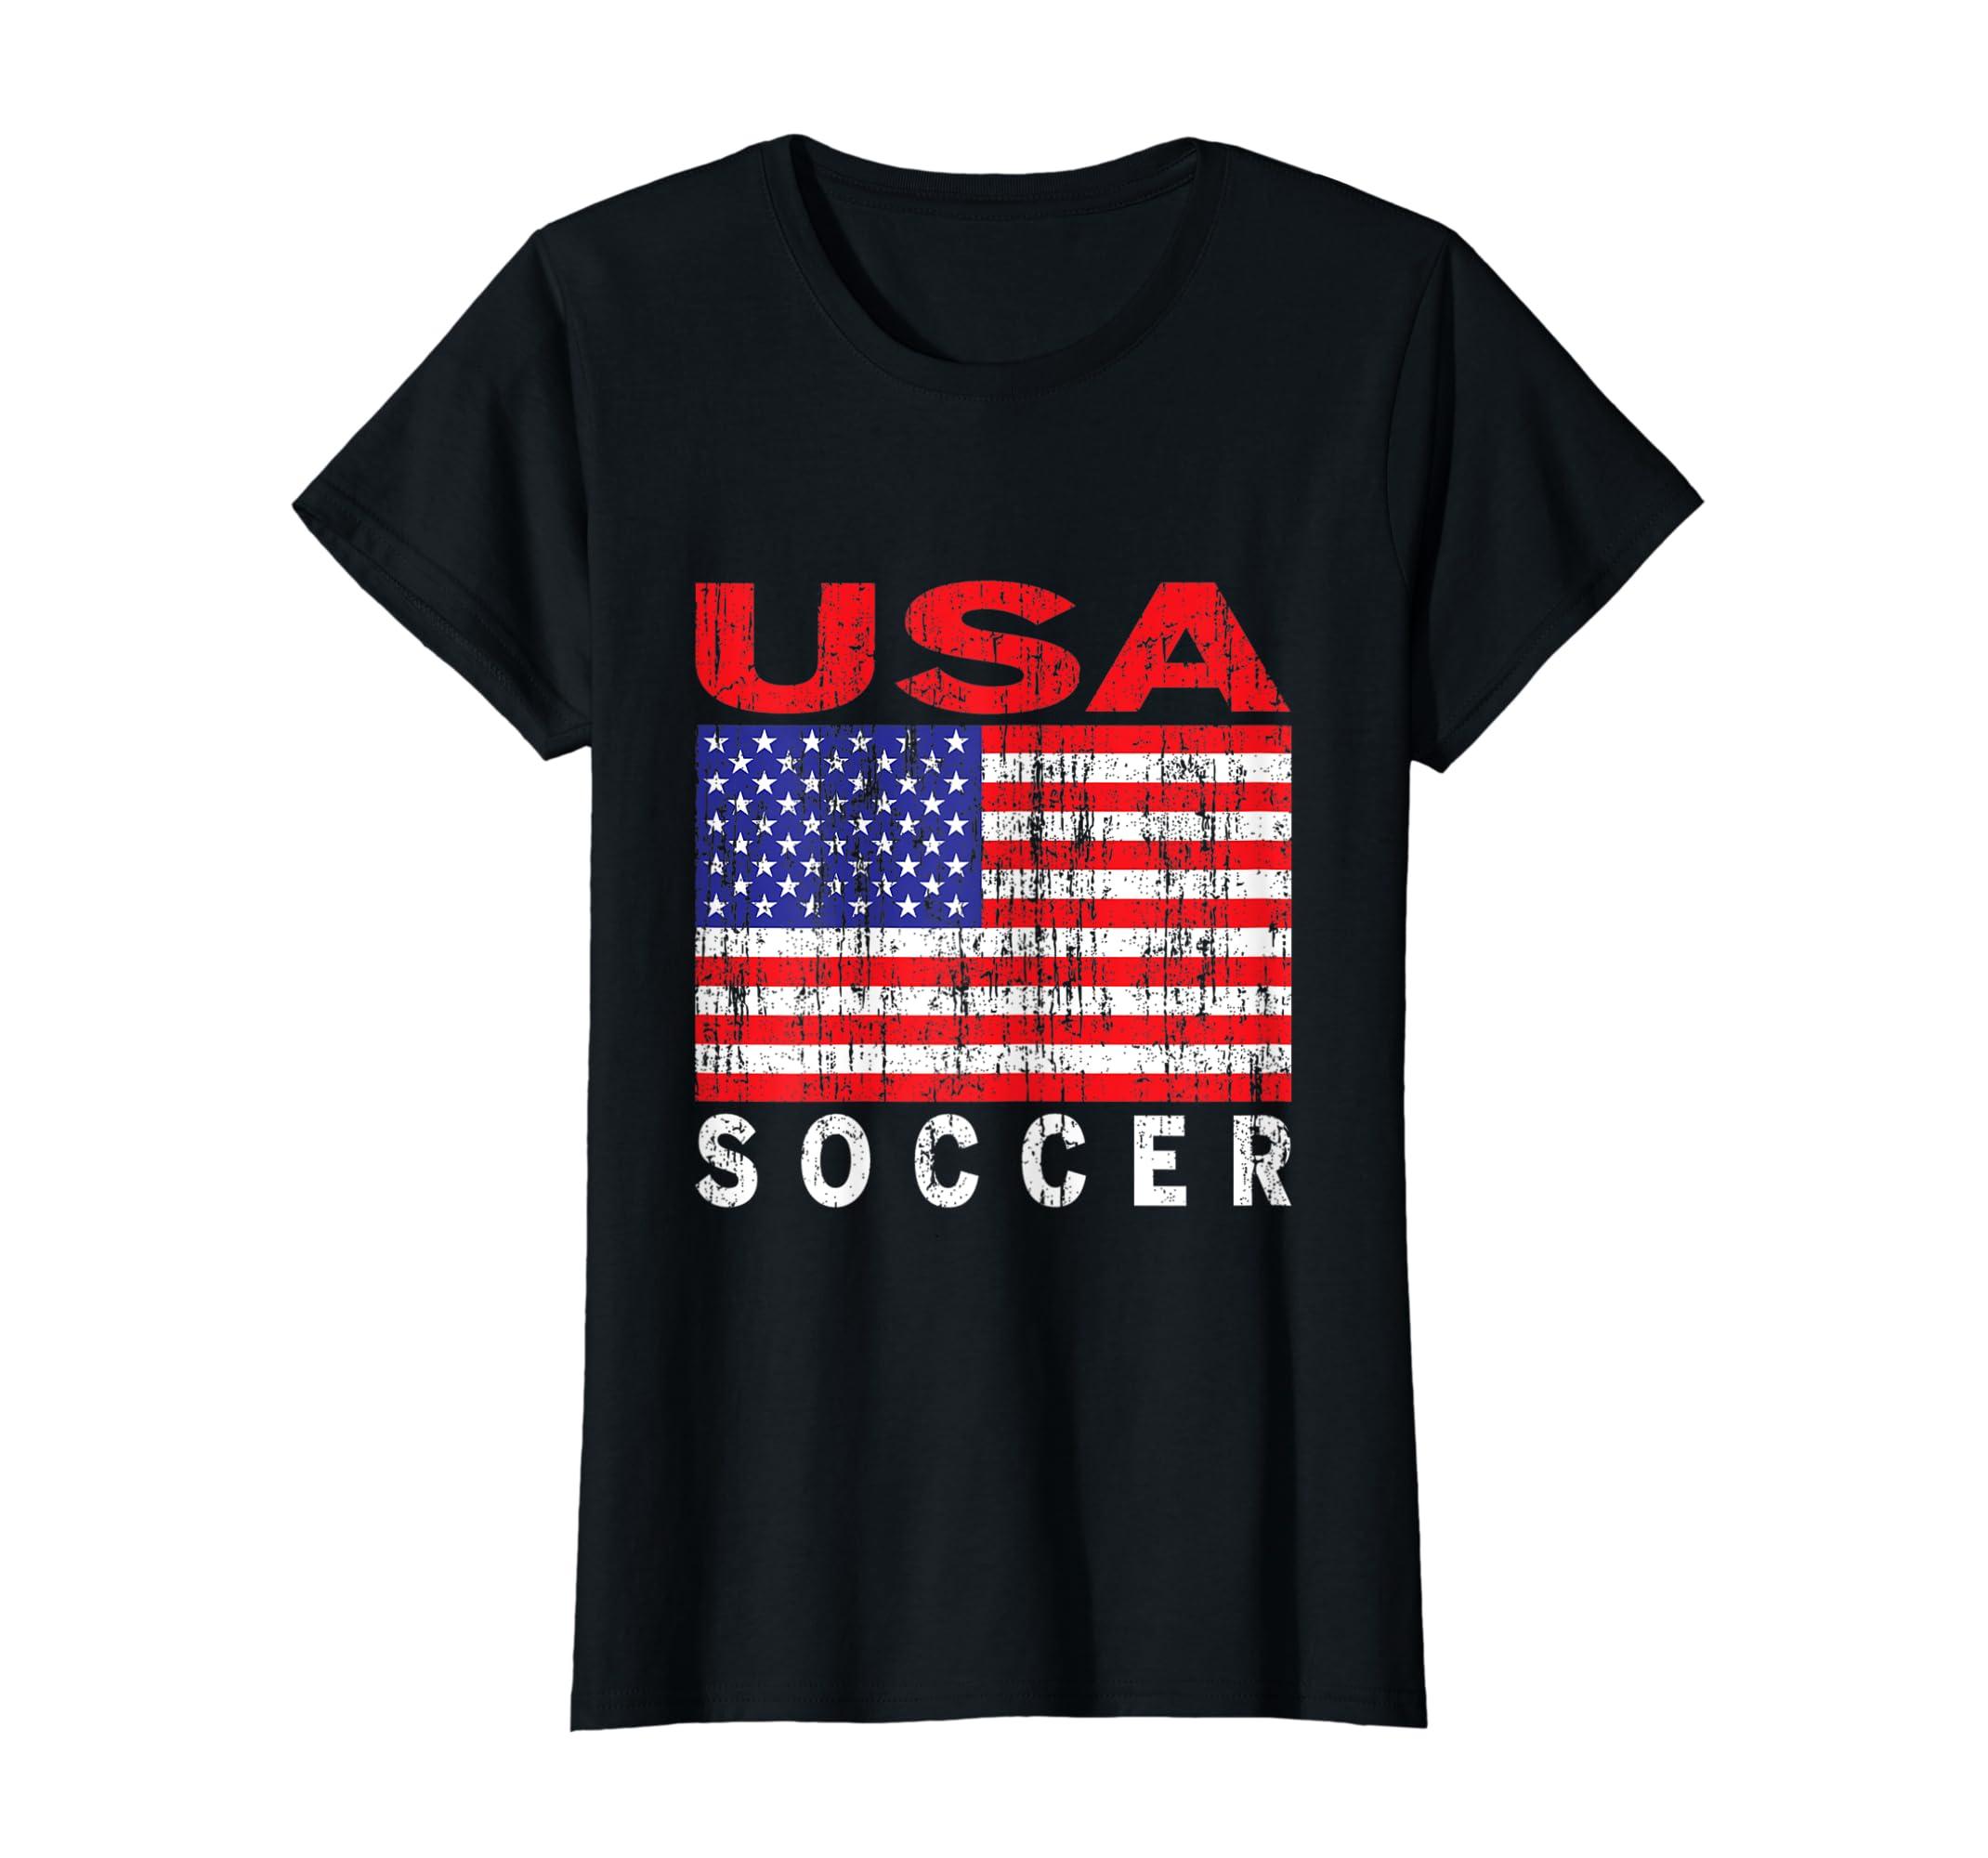 81b53c6f U.S. SOCCER MEN'S NIKE USA 2018/2019 VAPOR MATCH AWAY JERSEY – U.S. Soccer  Store